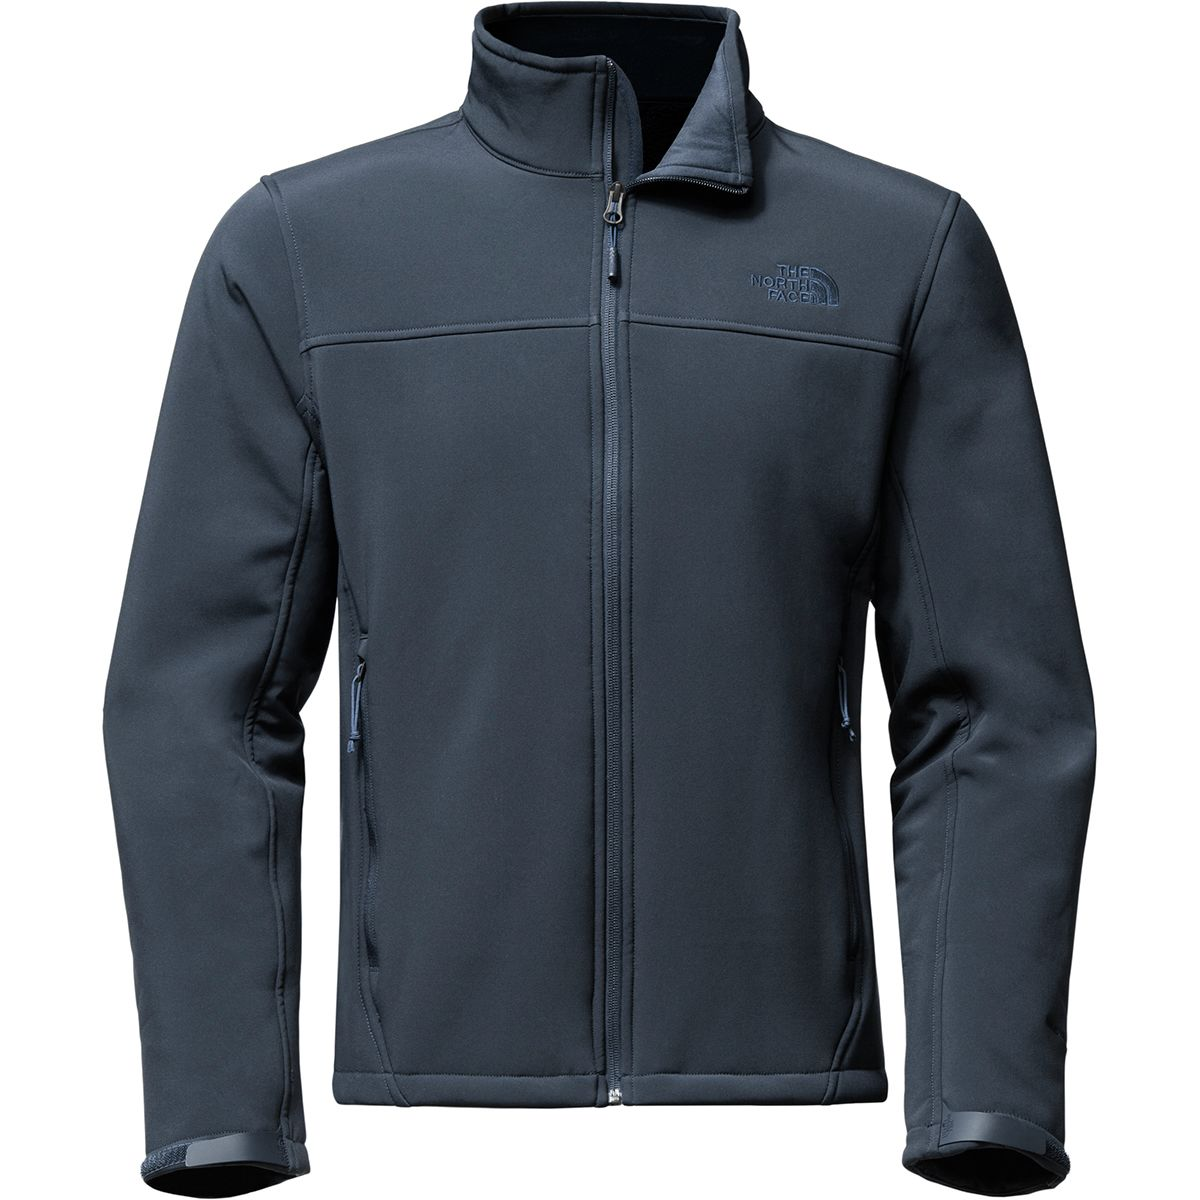 Apex Jacket Men's The Thermal North Face Chromium PkXZOiu